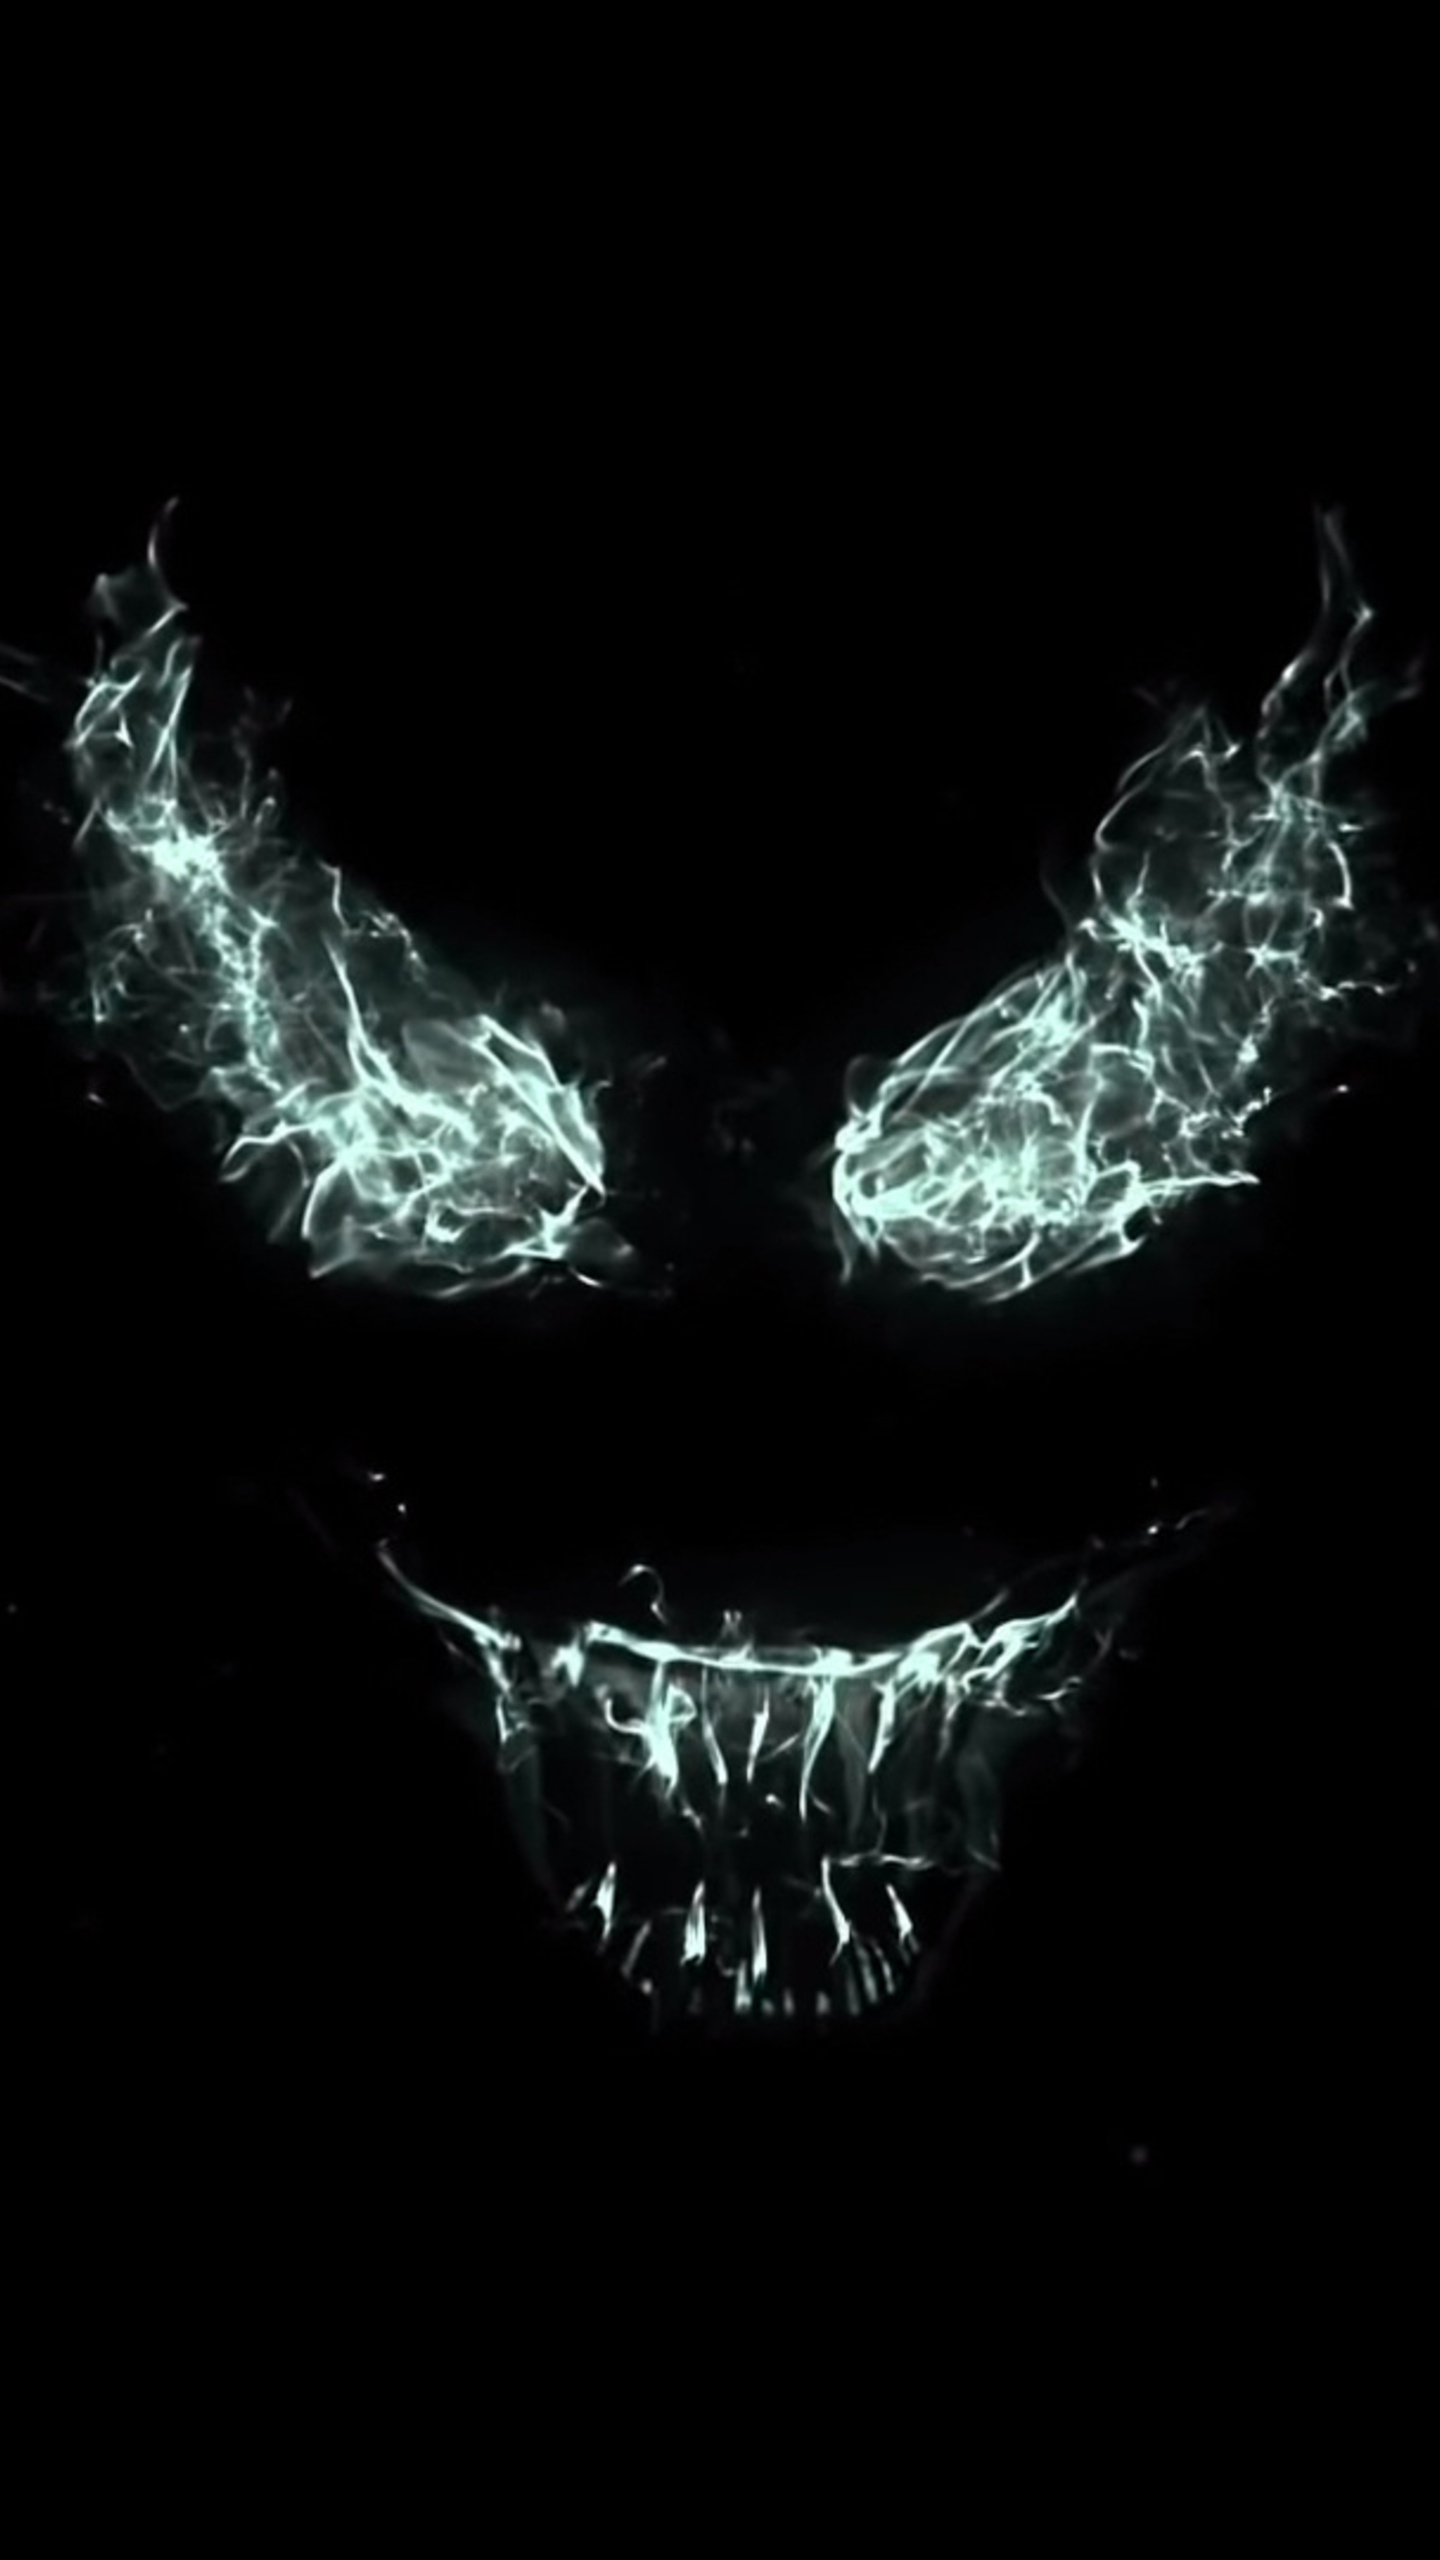 1440X2560 Venom Movie 2018 Samsung Galaxy S6,S7 ,Google -5268